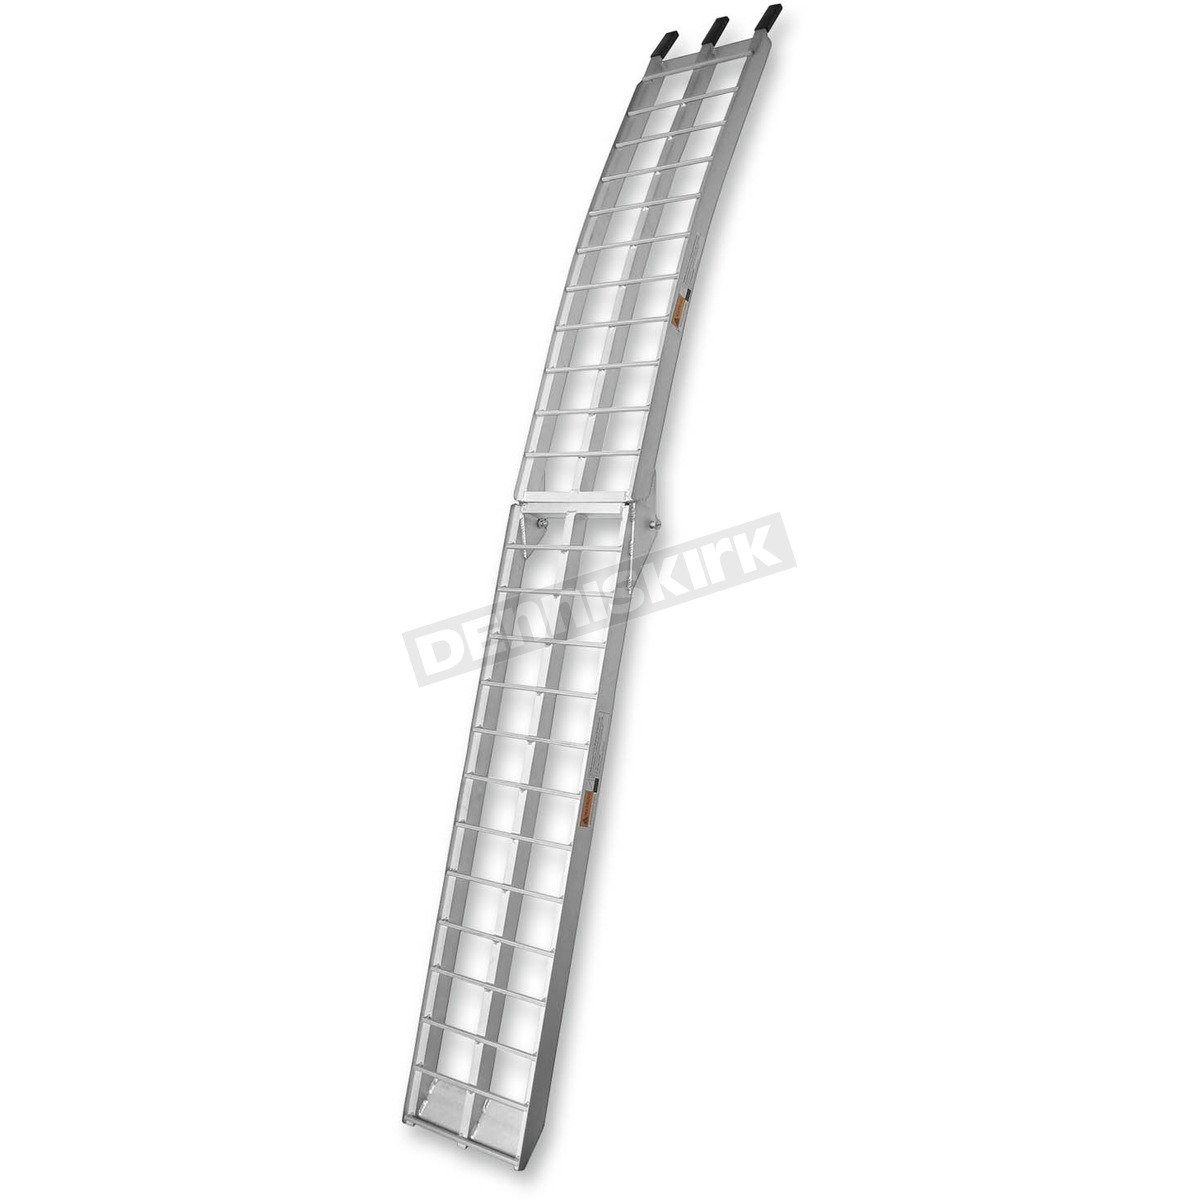 Motorsport Products Folding Ramp